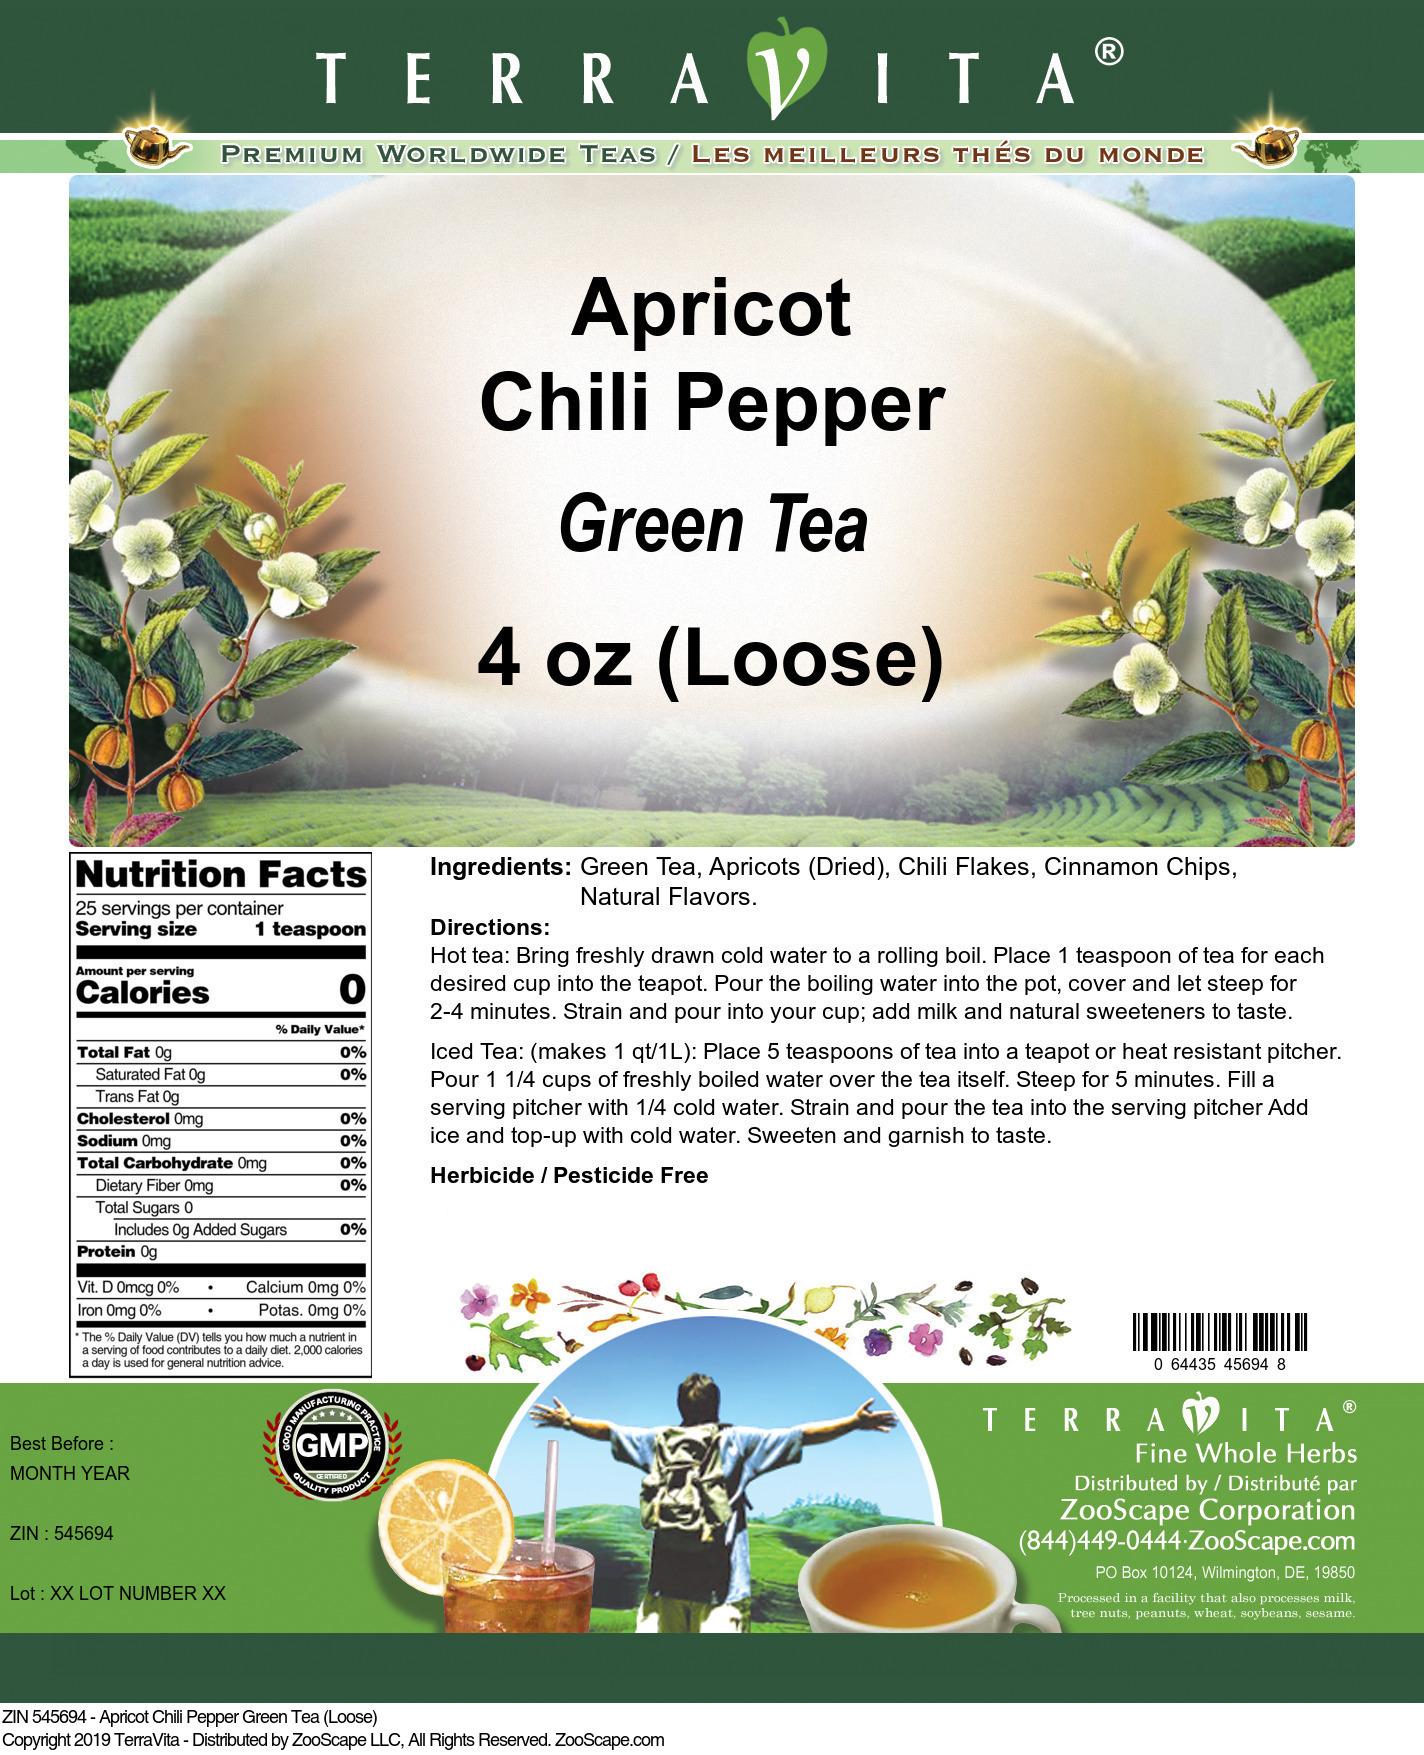 Apricot Chili Pepper Green Tea